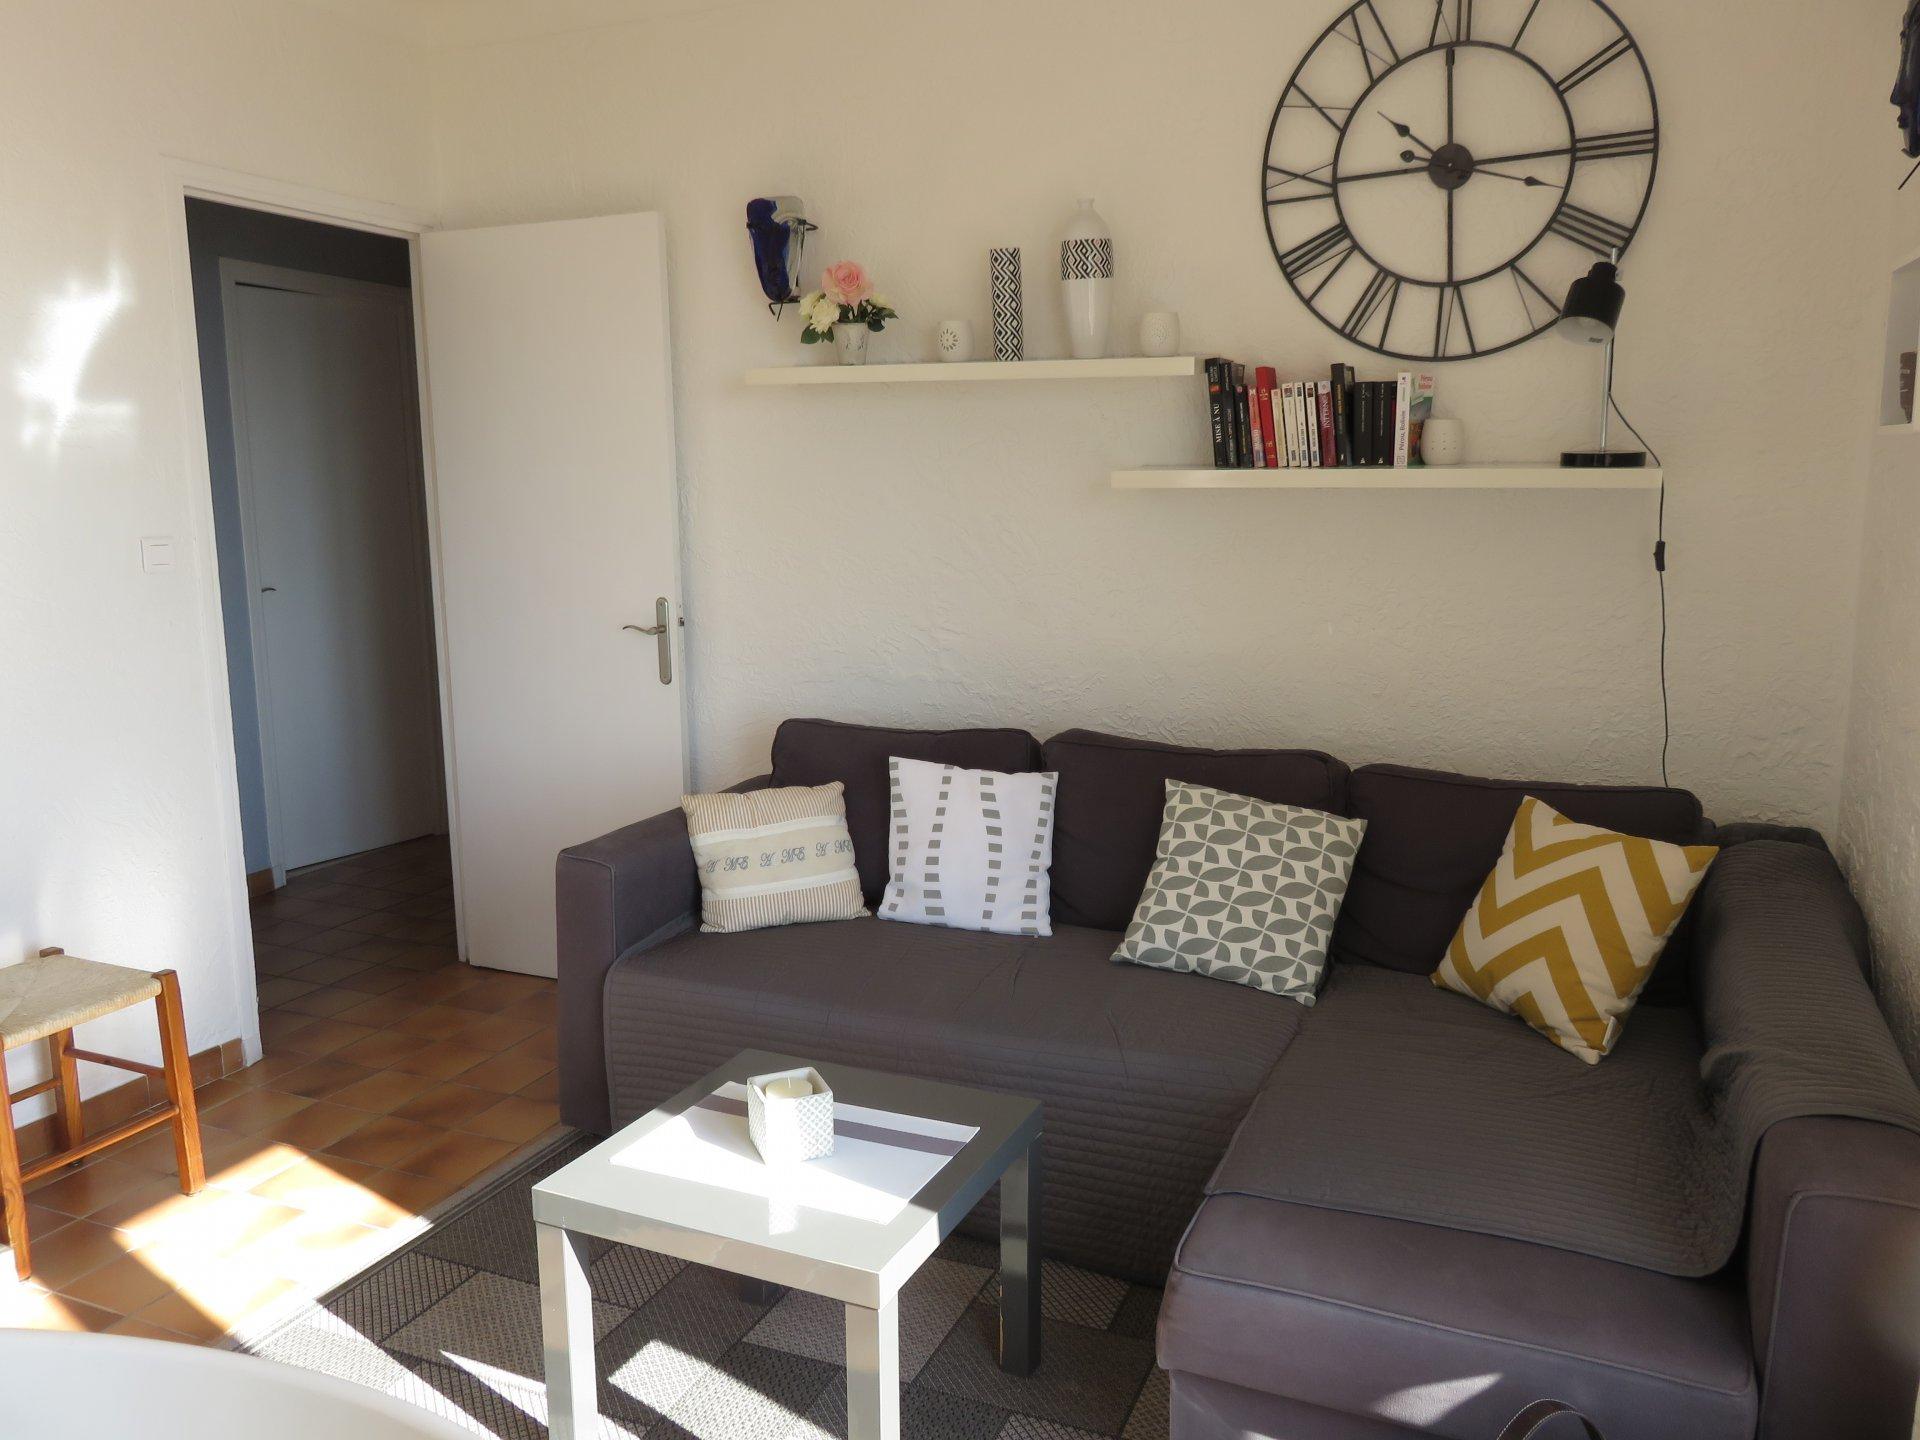 2/3 bedroom villa, cellar, garage